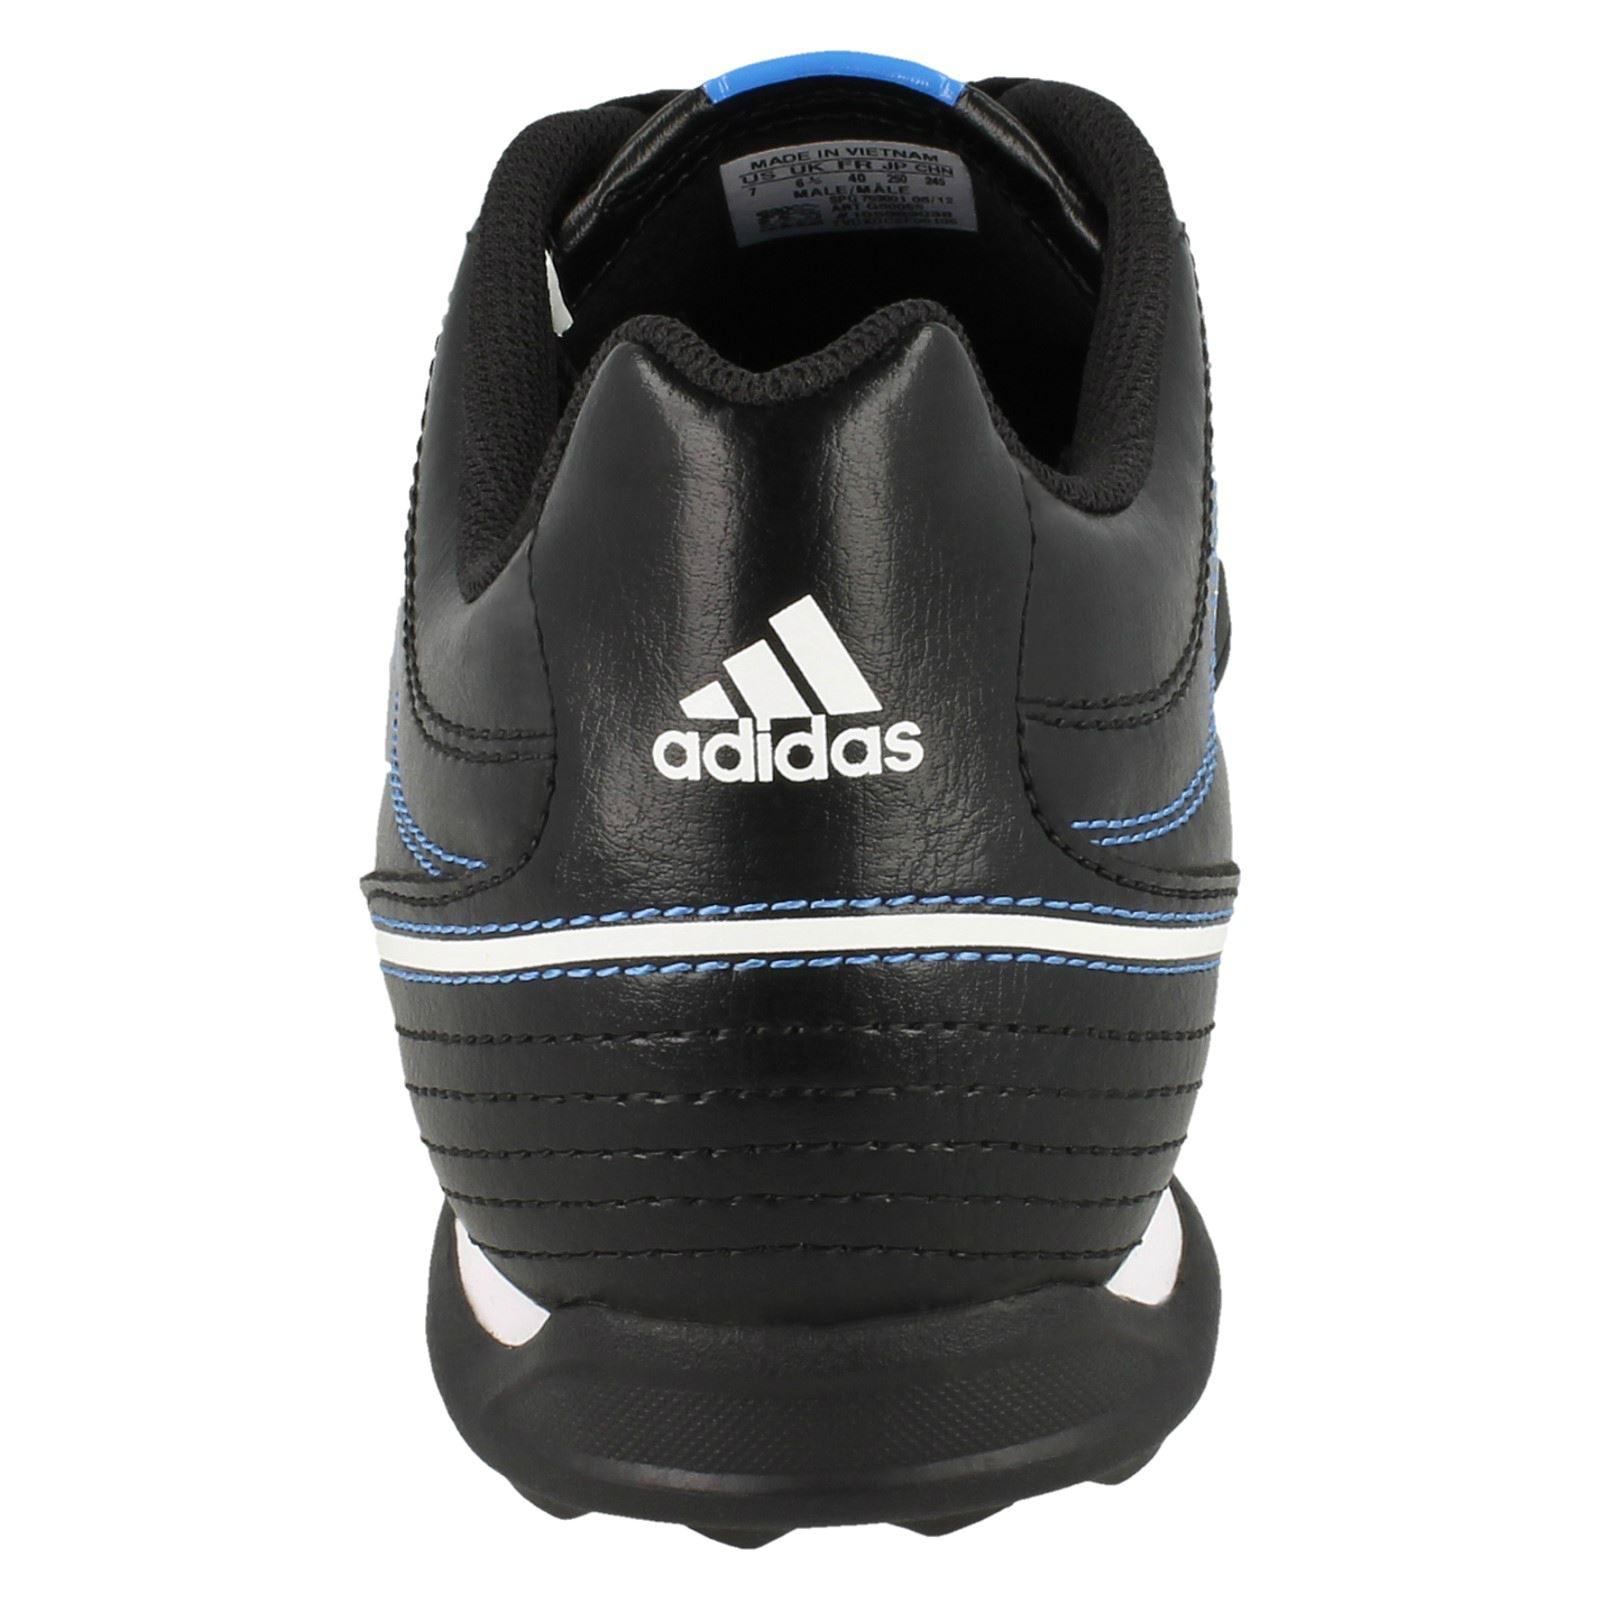 adidas shoes cambodia